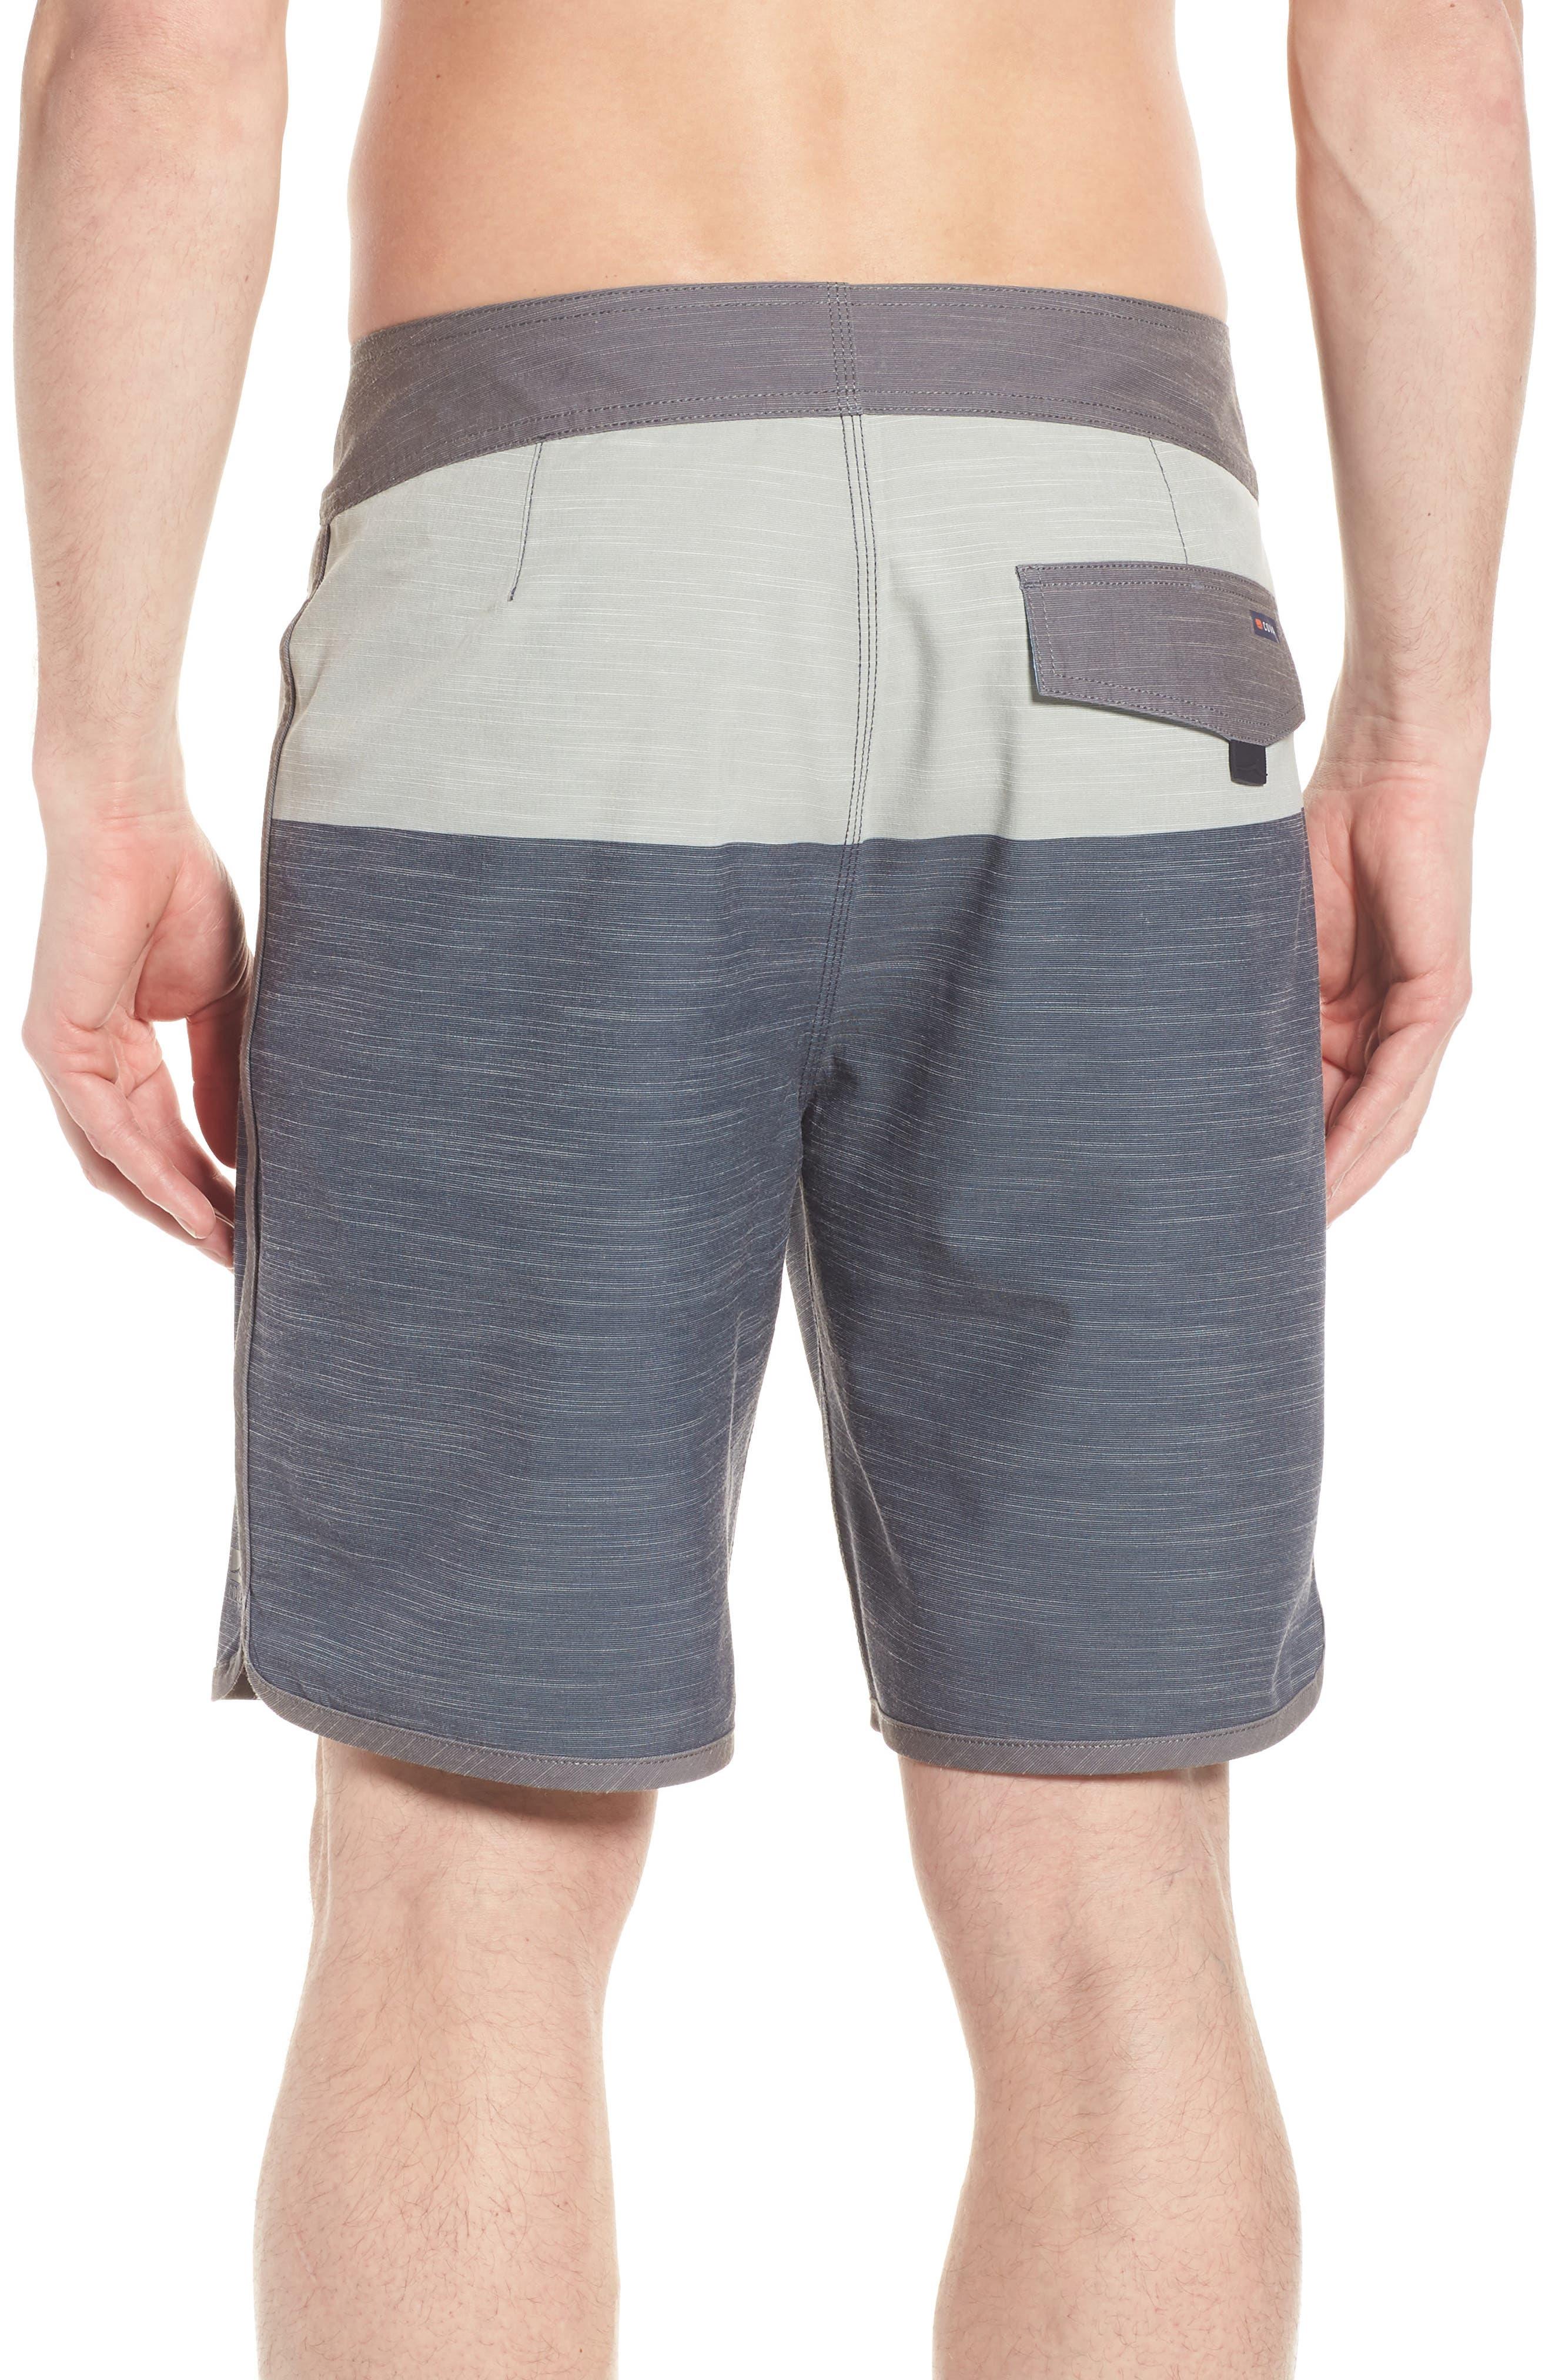 Beachcomber Board Shorts,                             Alternate thumbnail 2, color,                             CHARCOAL